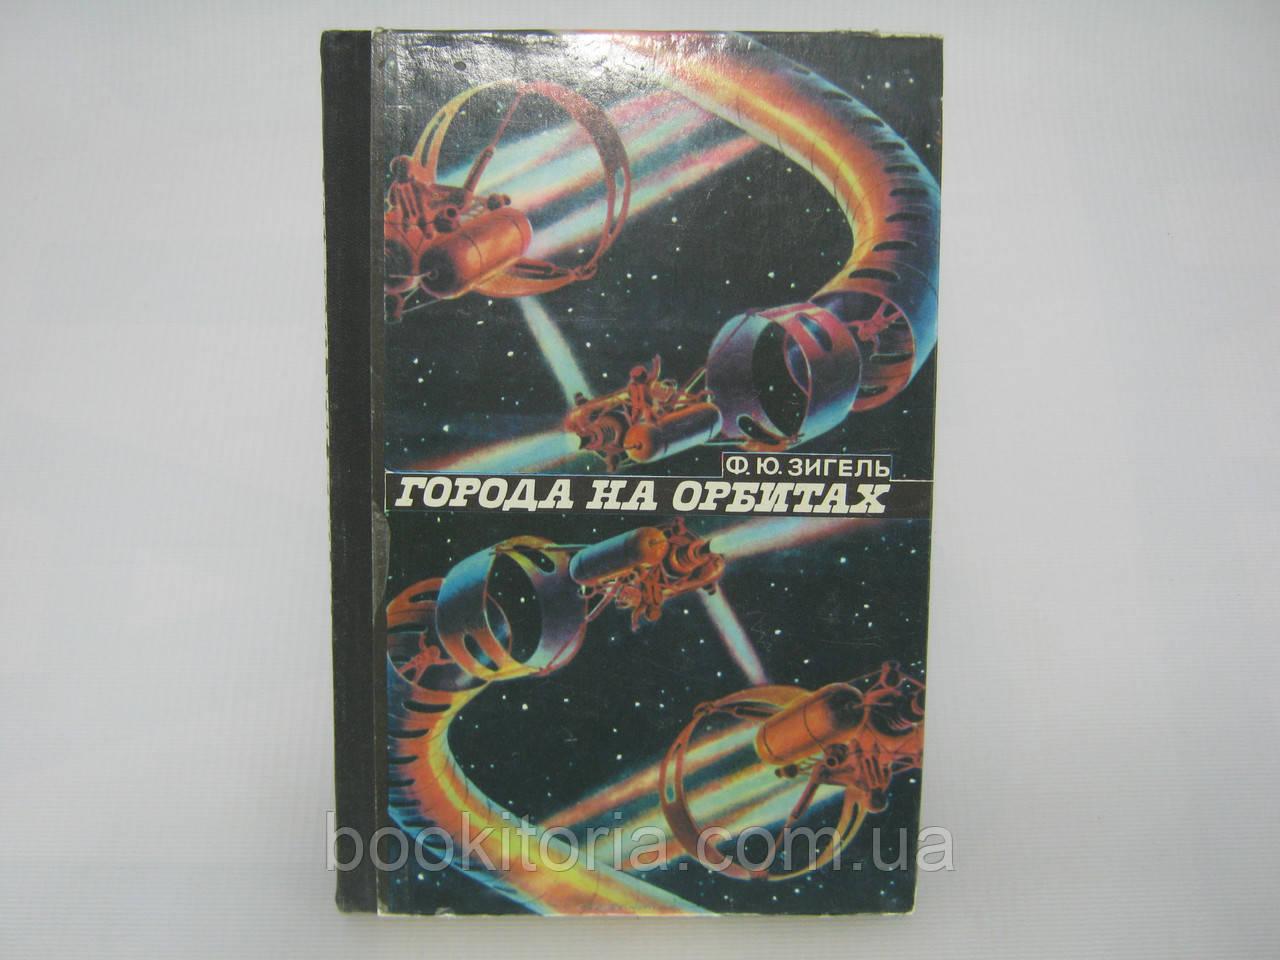 Зигель Ф.Ю. Города на орбитах (б/у).